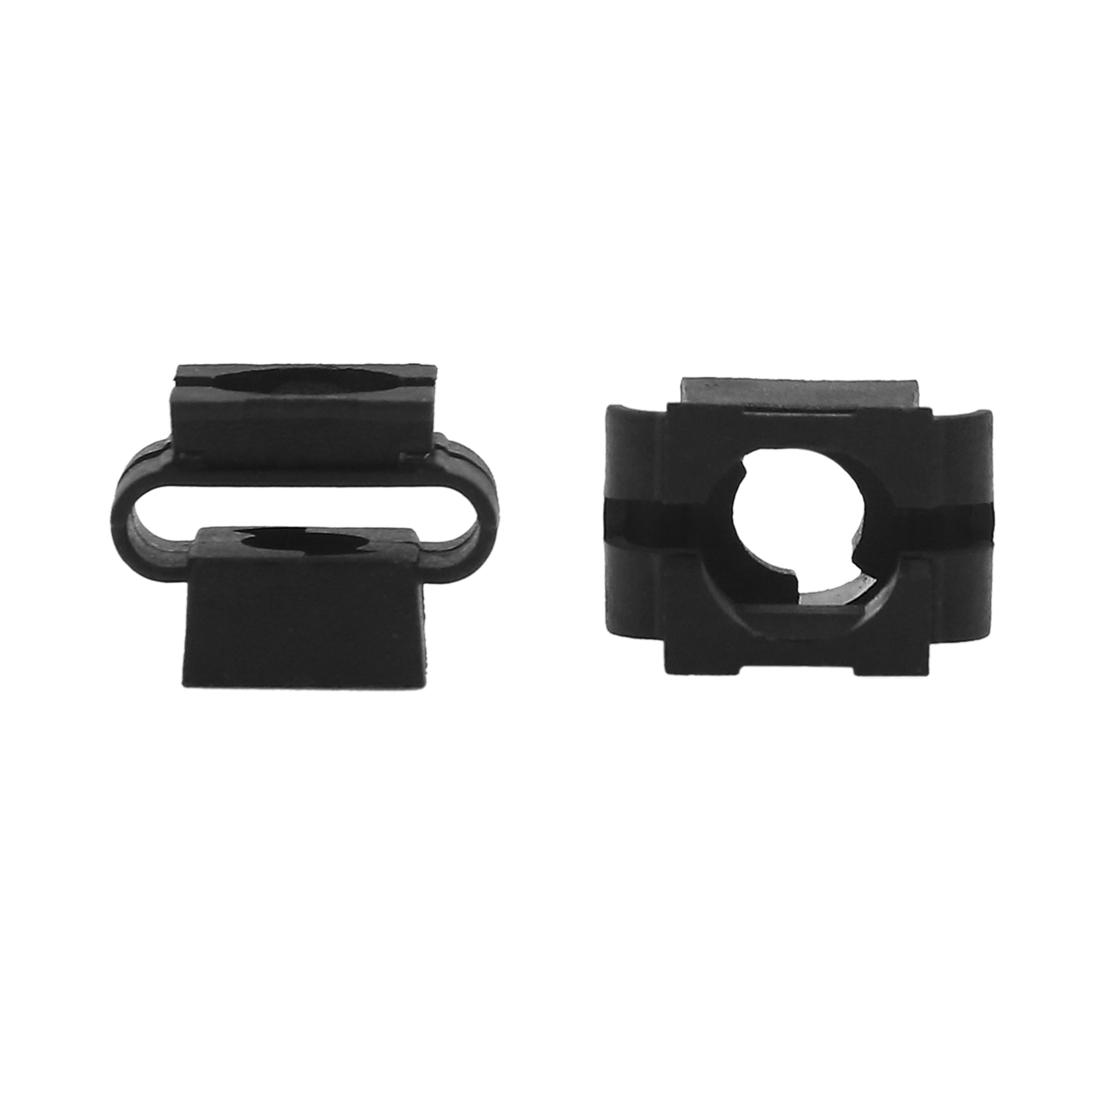 100 Pcs Black Interior Door Trim Panel Board Moulding Rivet Retainers Fastener